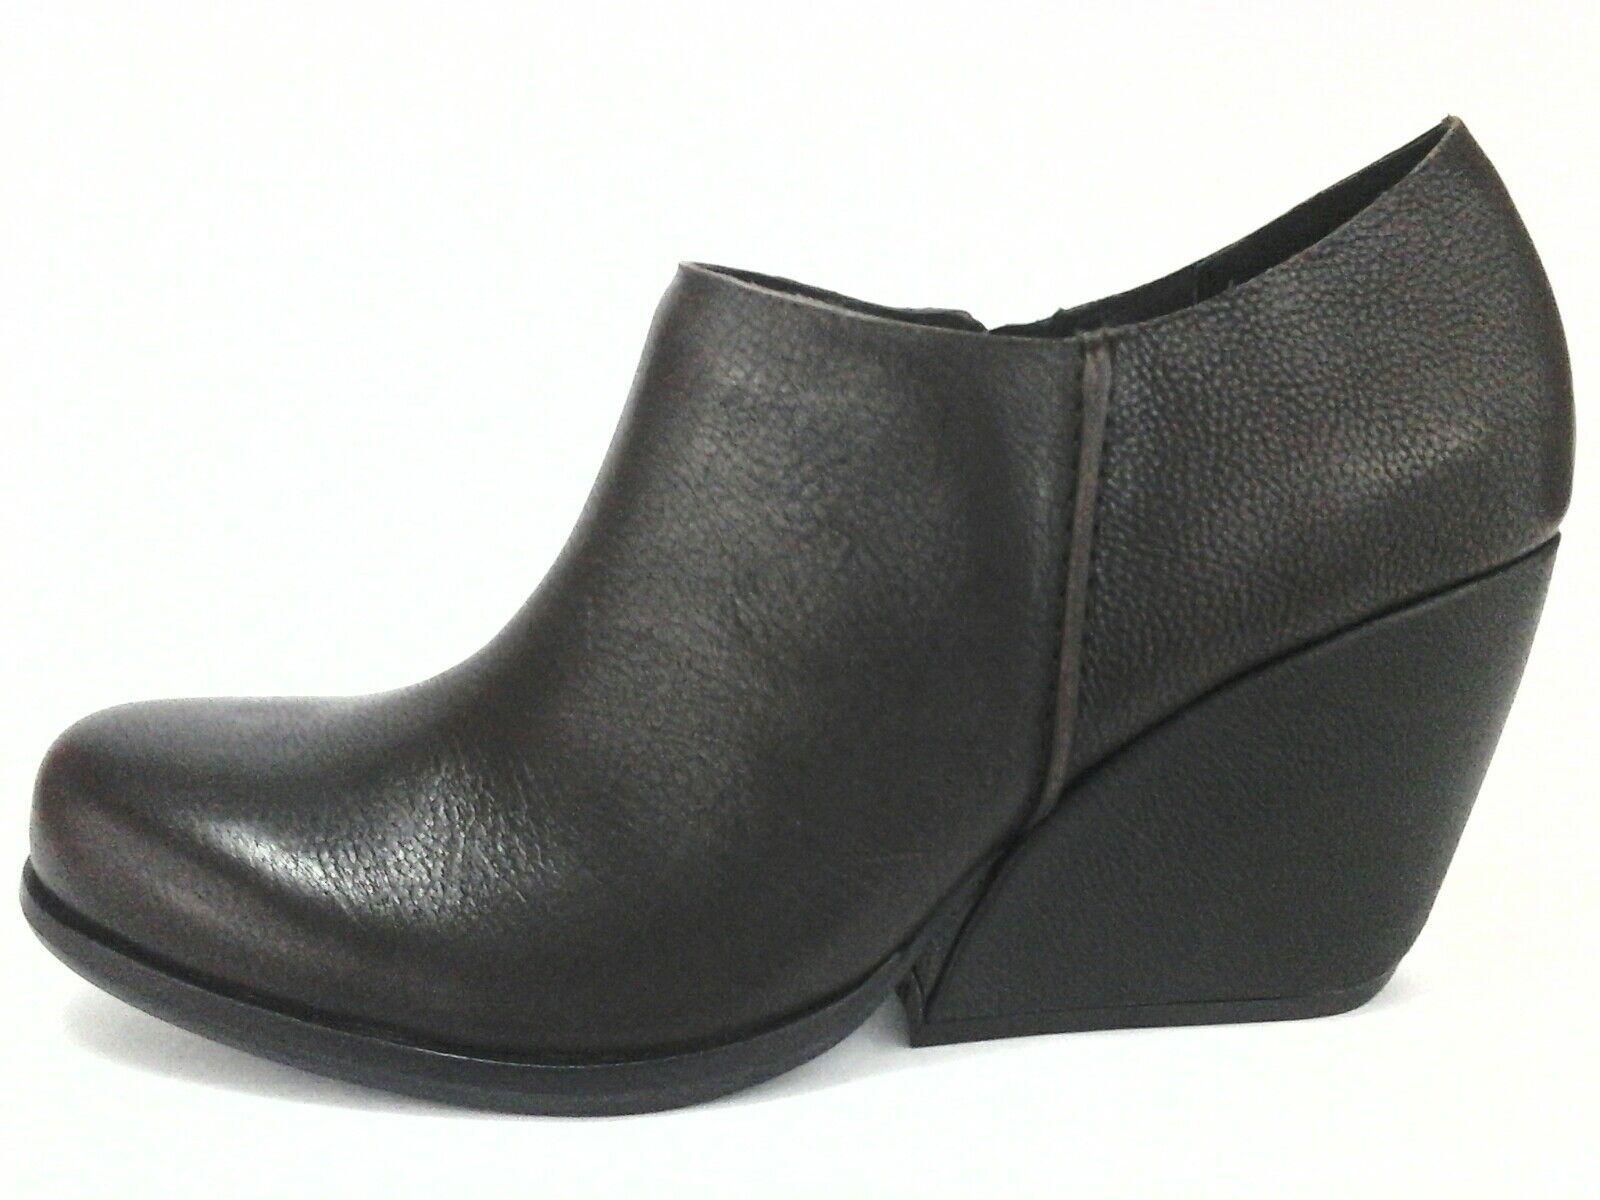 KORK-EASE Ankle Boots Korks NATALYA Brown Wedge Shoes Women's US 10 $190